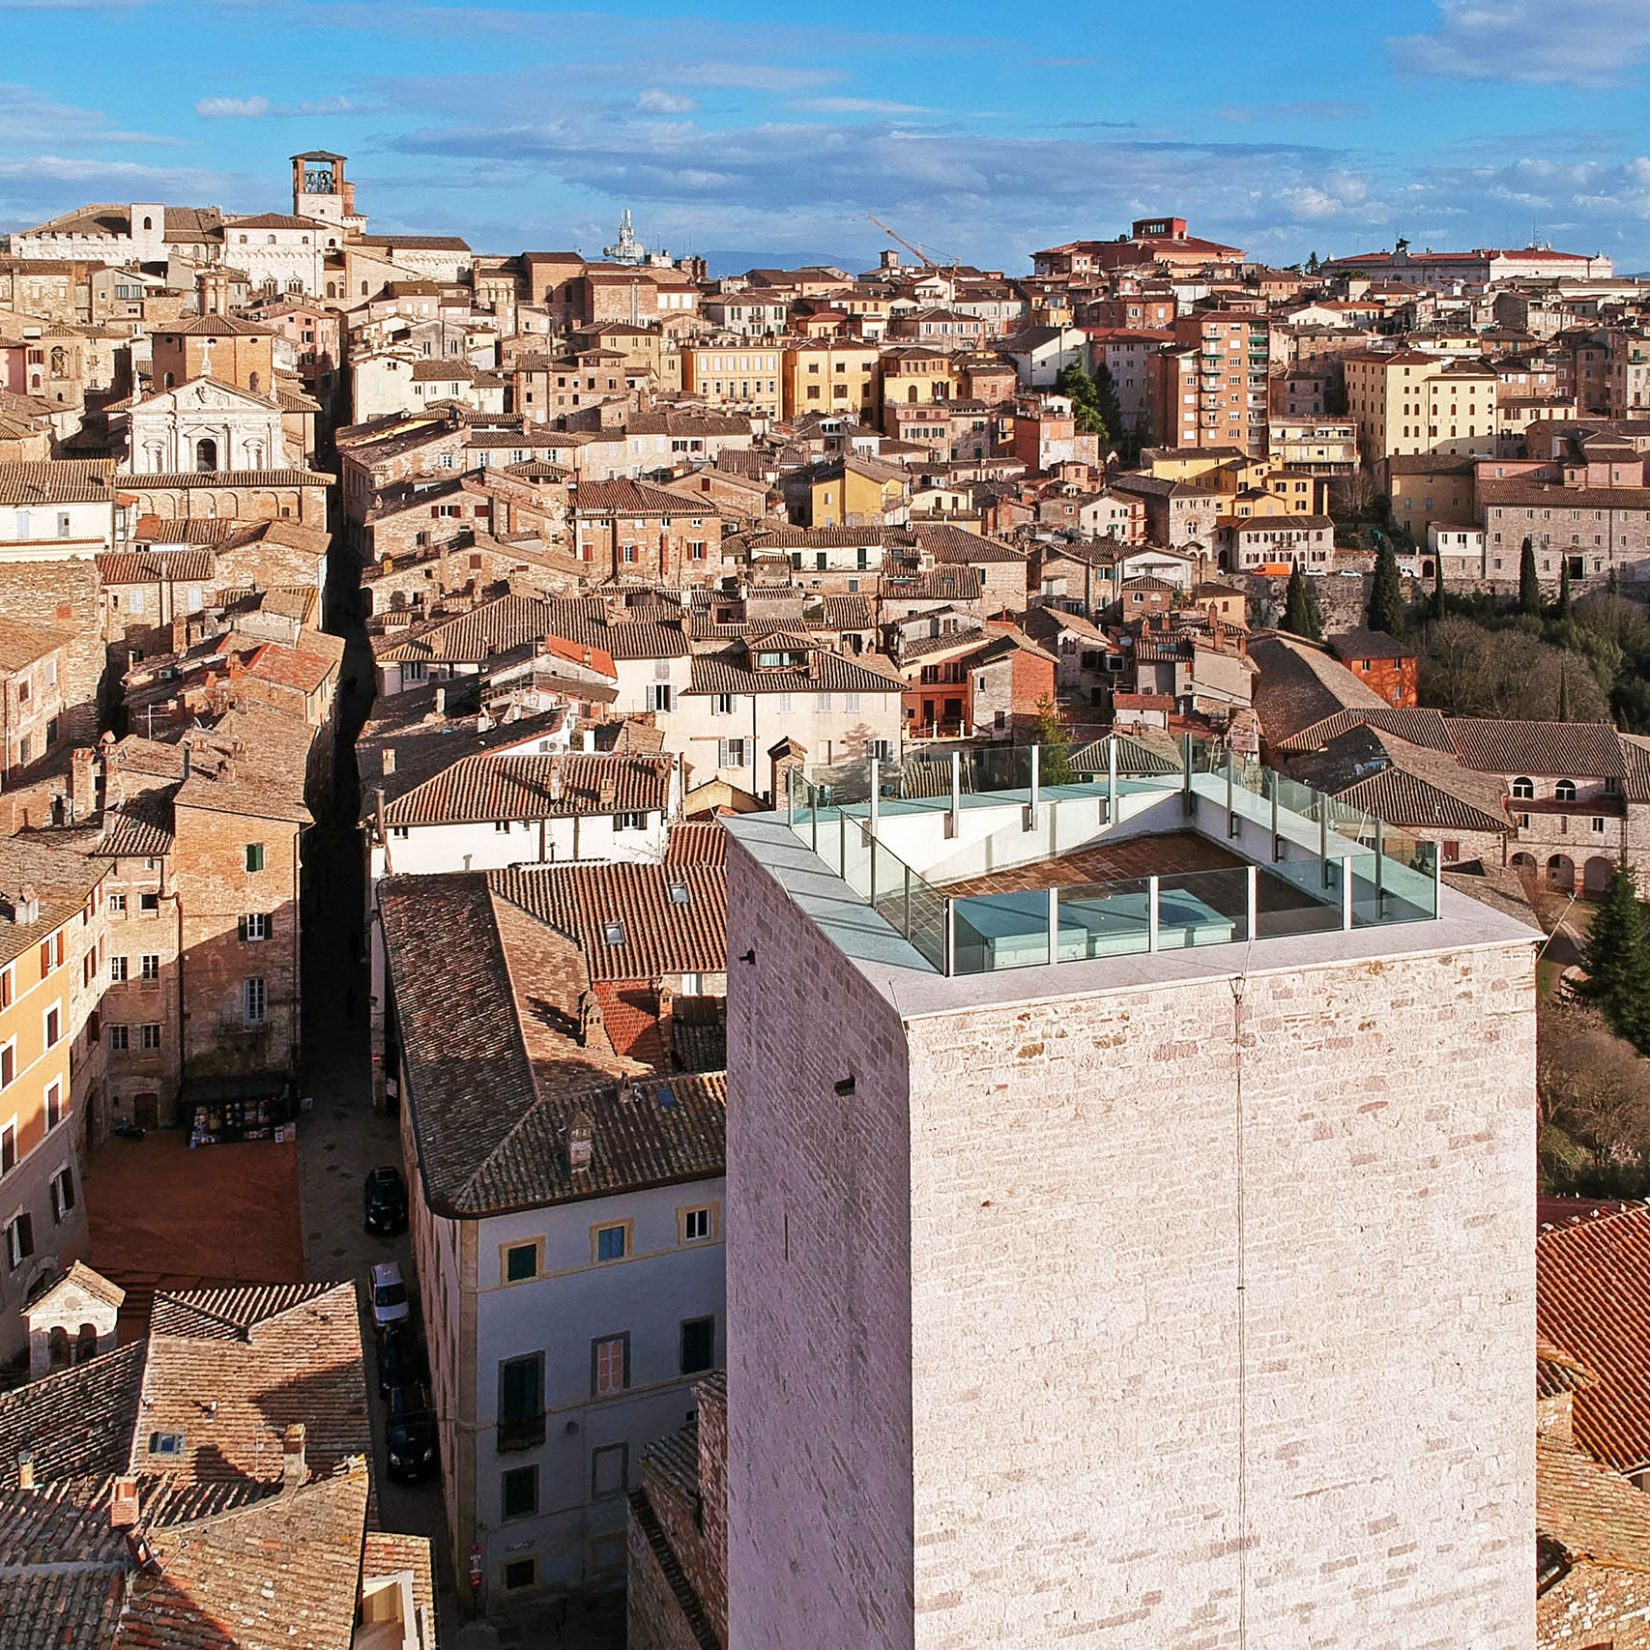 Torre degli Sciri - Perugia, Umbria - Articity